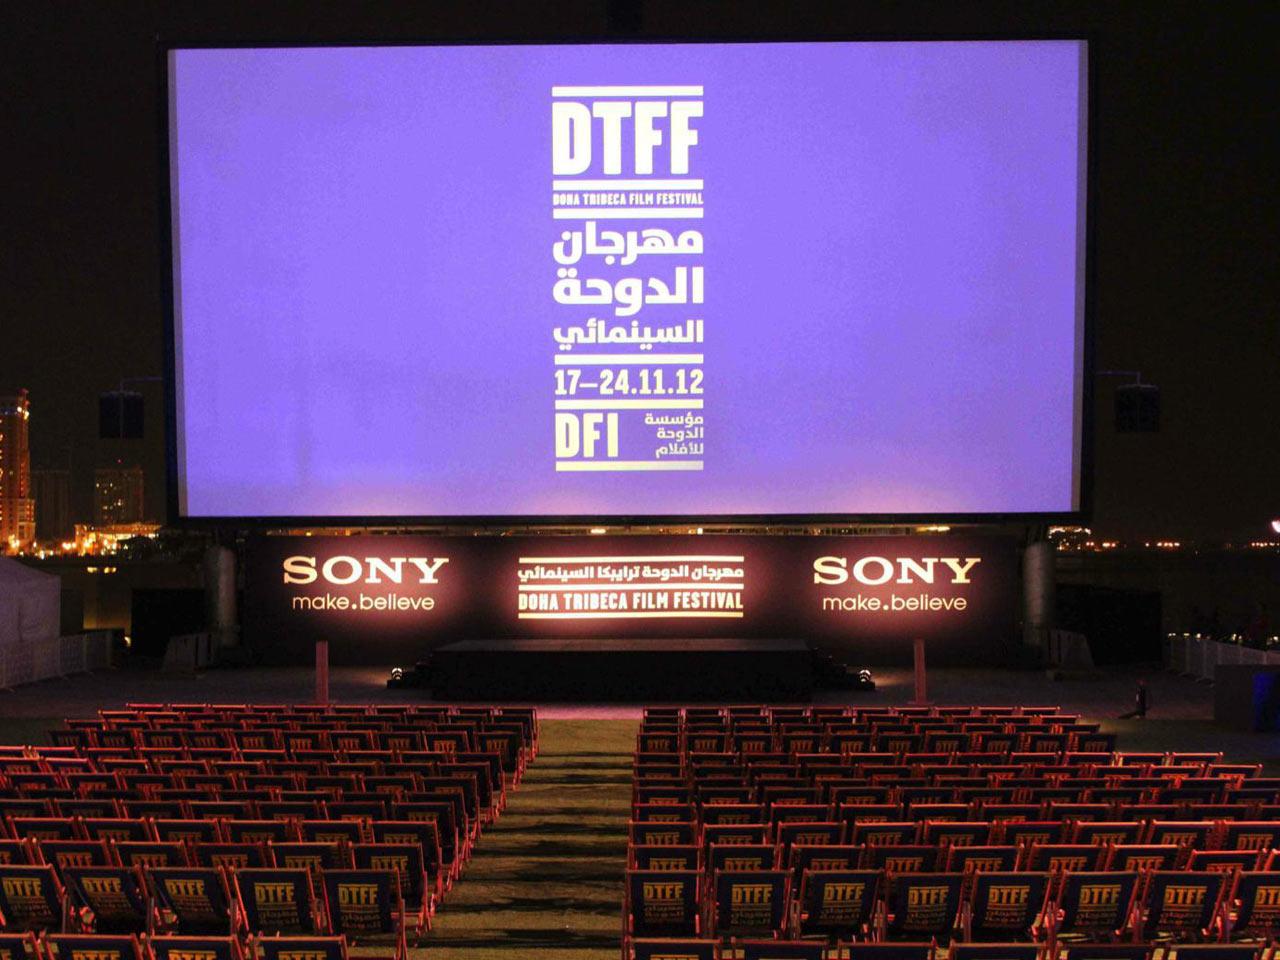 grandstand-seats-events-setup-rental-stadium-seating-sport-management-film-festival-seating-screening-f1-open-air-cinema-34